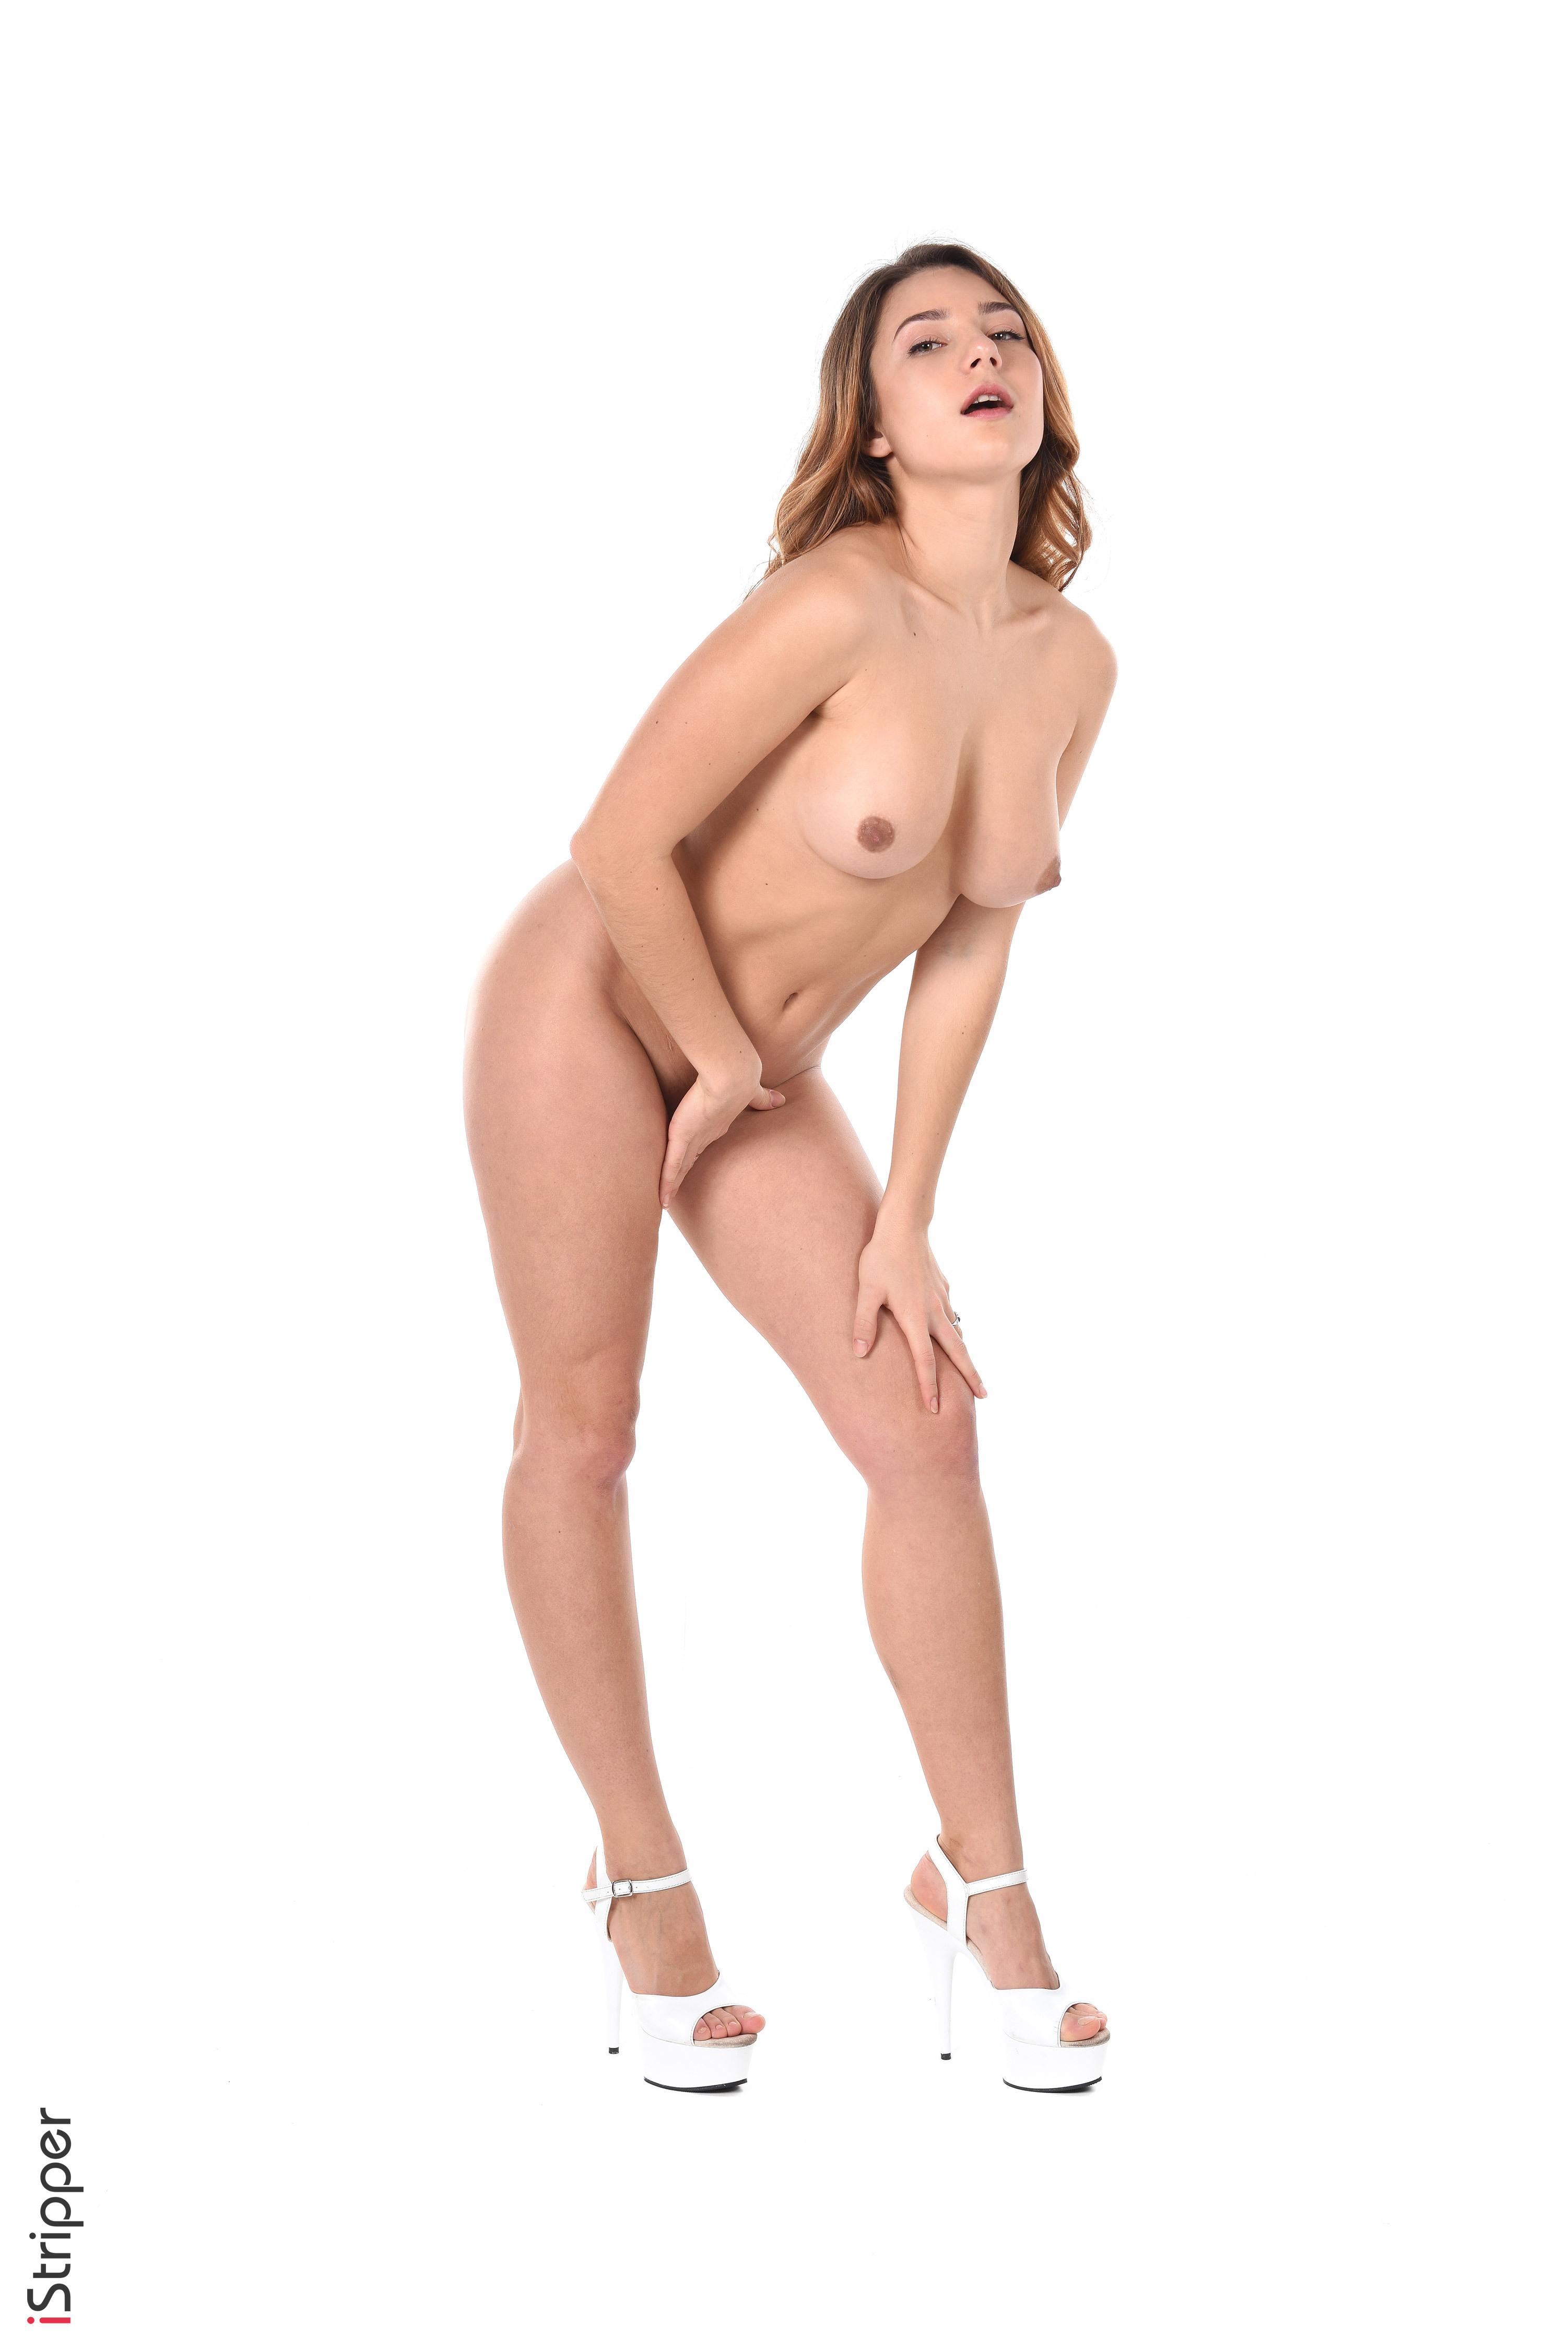 porn wallpaper site